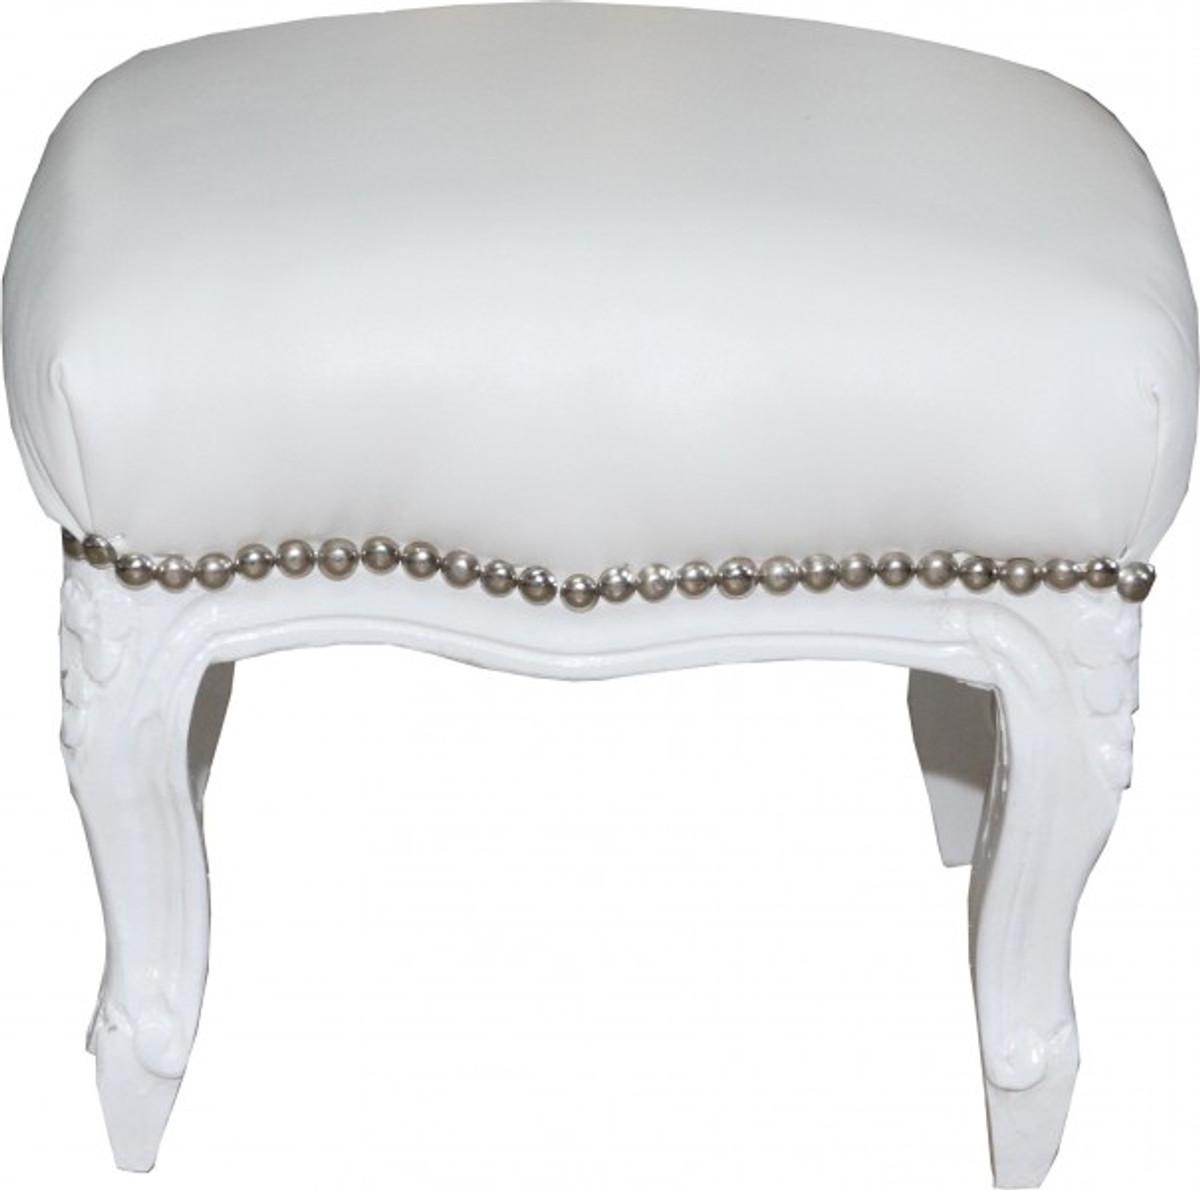 casa padrino barock fu hocker wei wei lederoptik hocker m bel hocker barock hocker barock. Black Bedroom Furniture Sets. Home Design Ideas